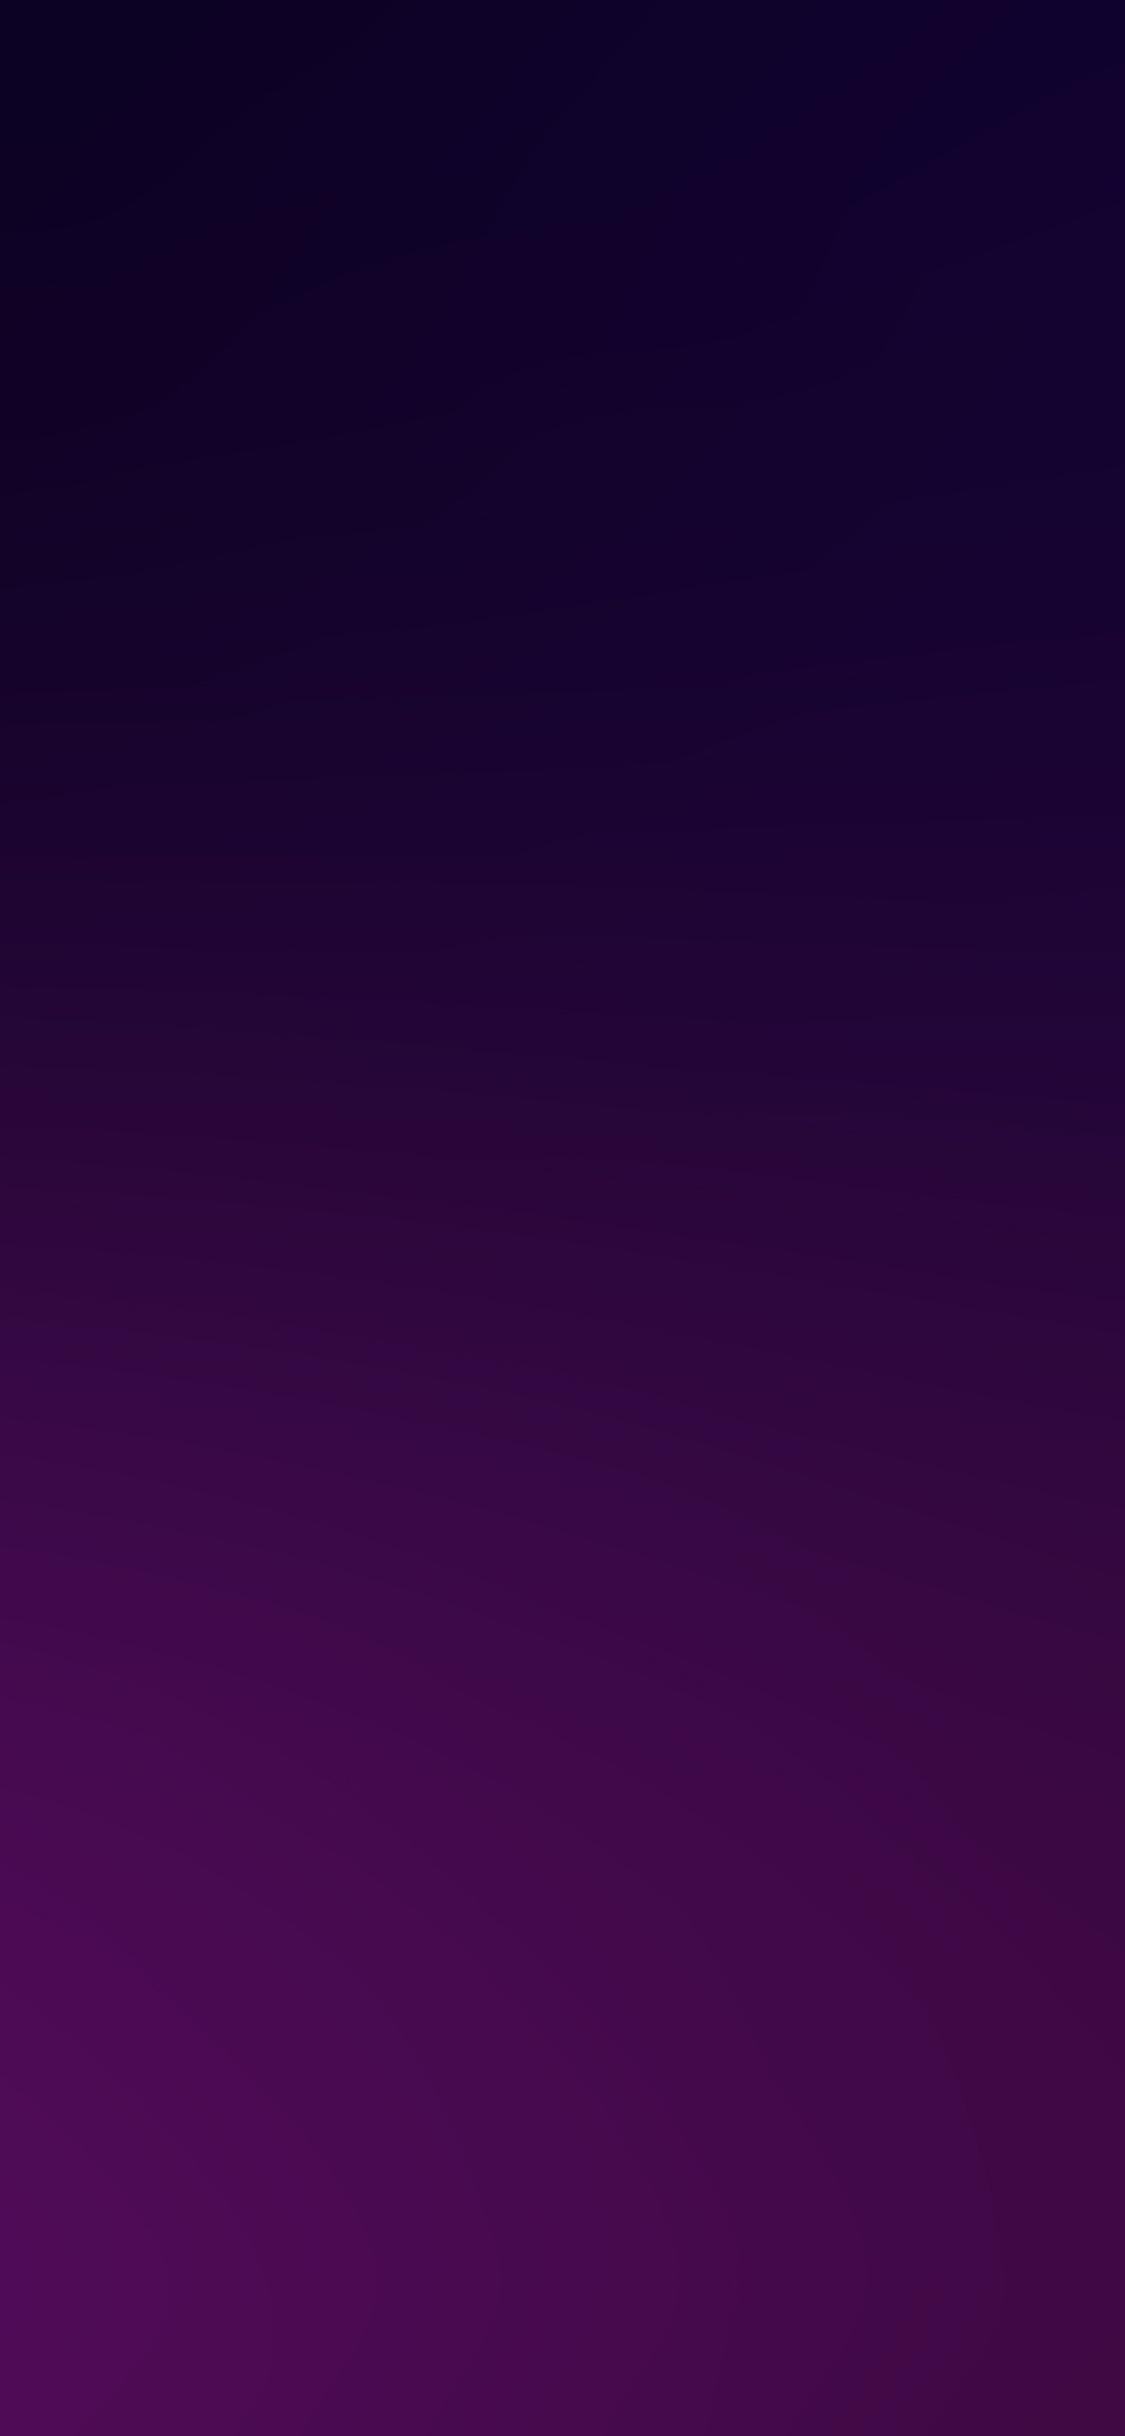 iPhoneXpapers.com-Apple-iPhone-wallpaper-sk61-dark-purple-blur-gradation